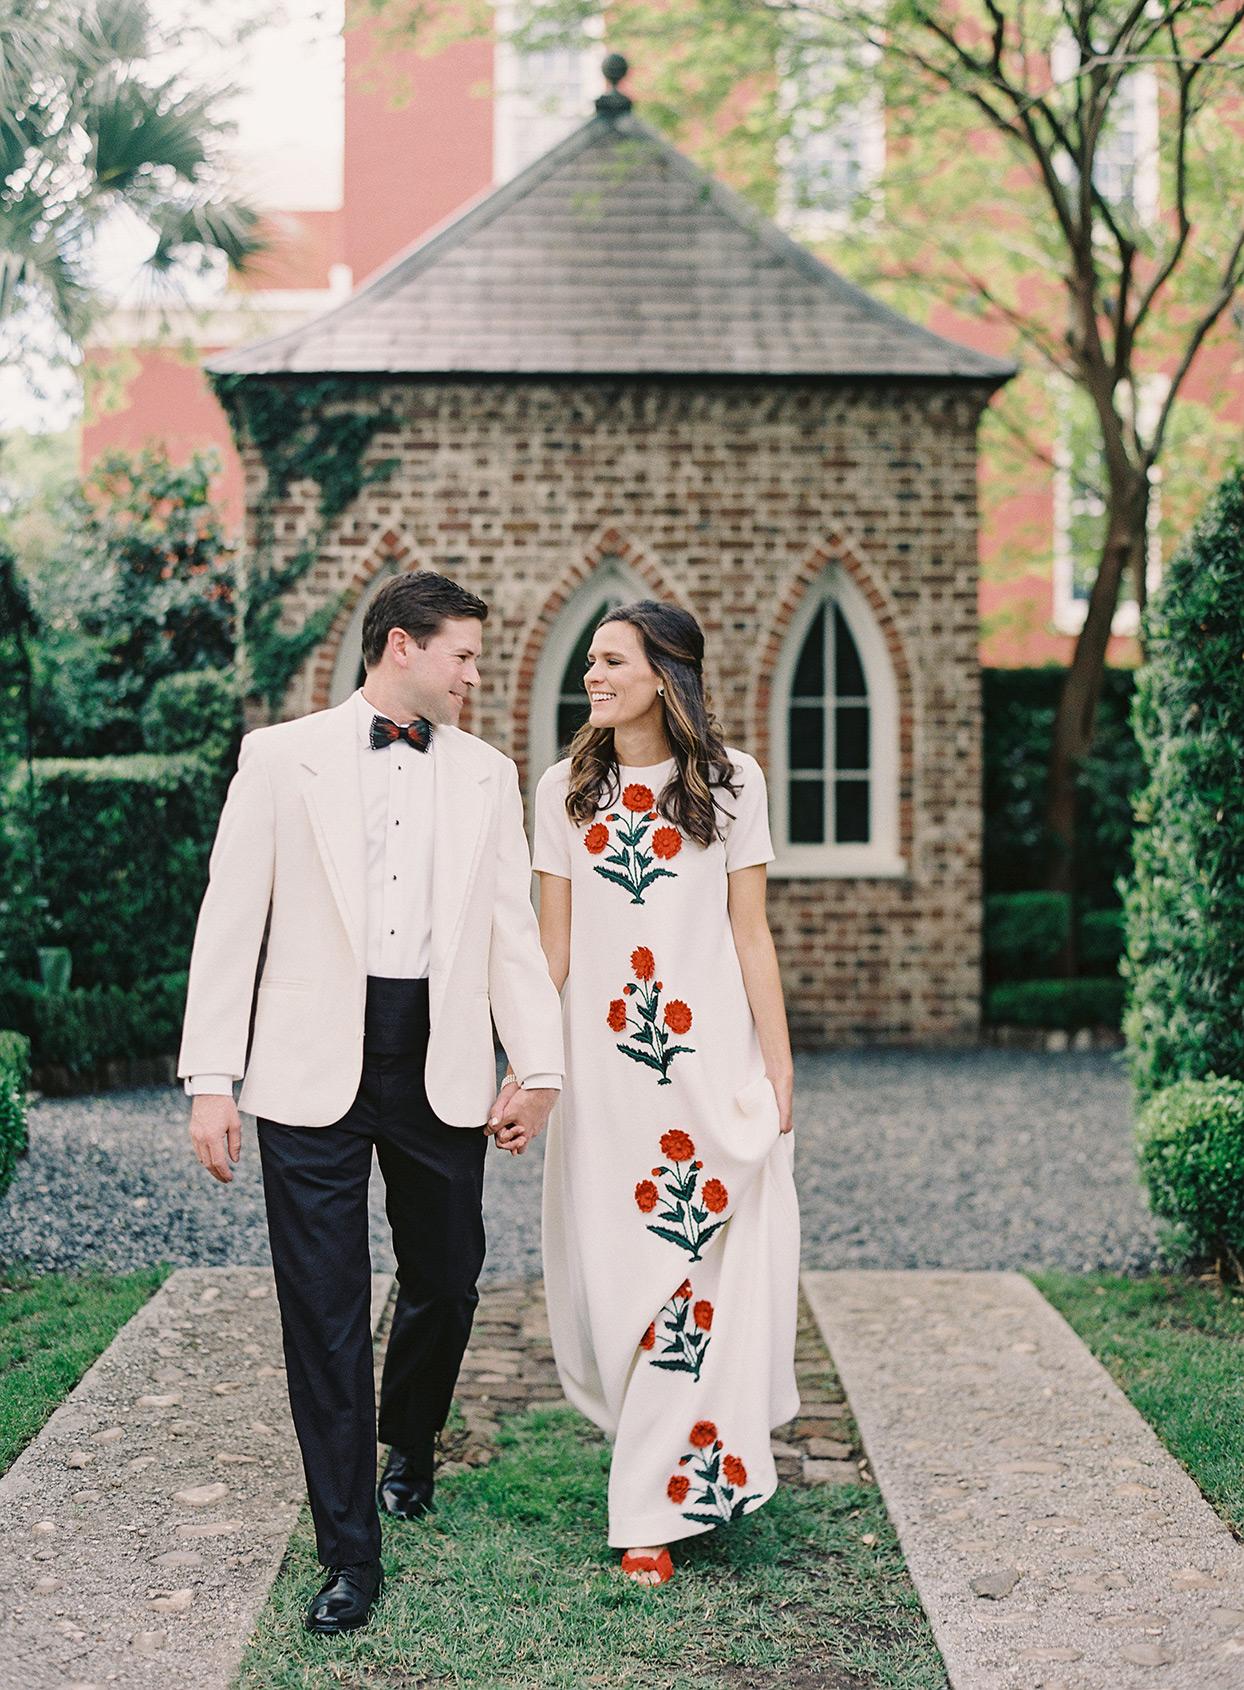 beverly steve wedding couple walking through garden